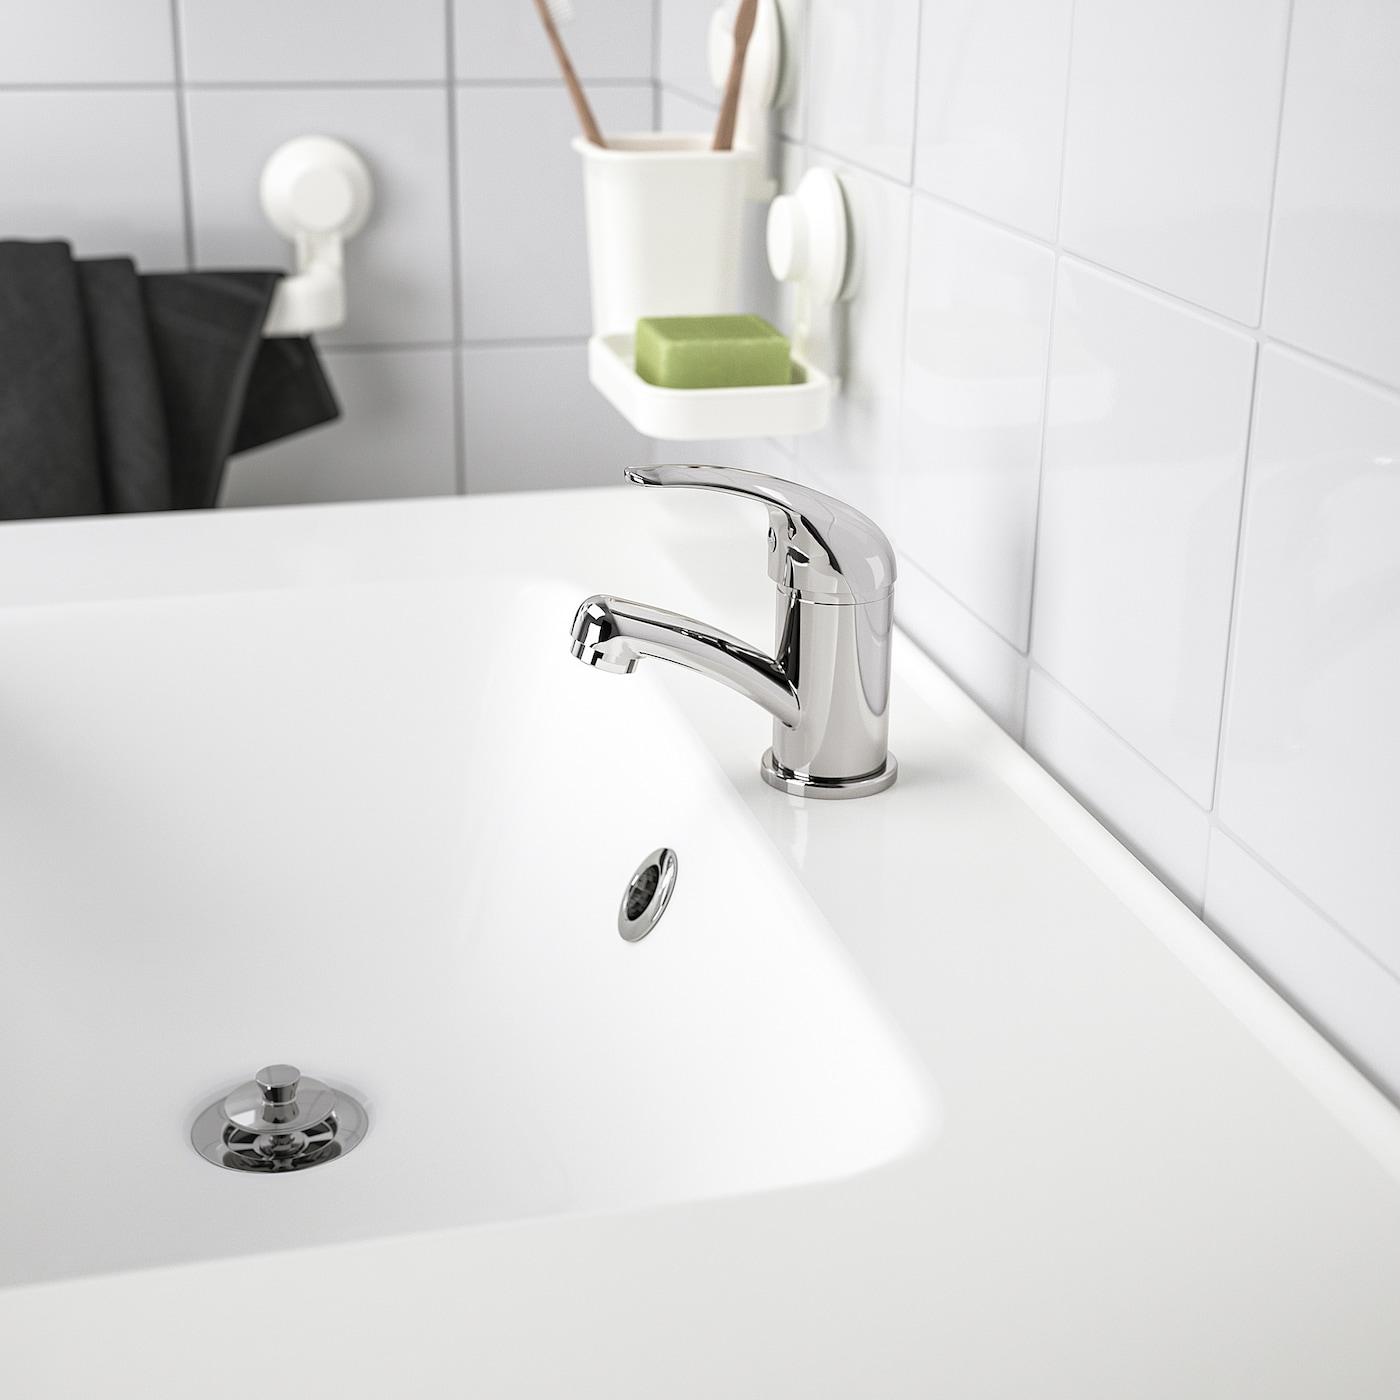 OLSKÄR Wash-basin mixer tap - chrome-plated